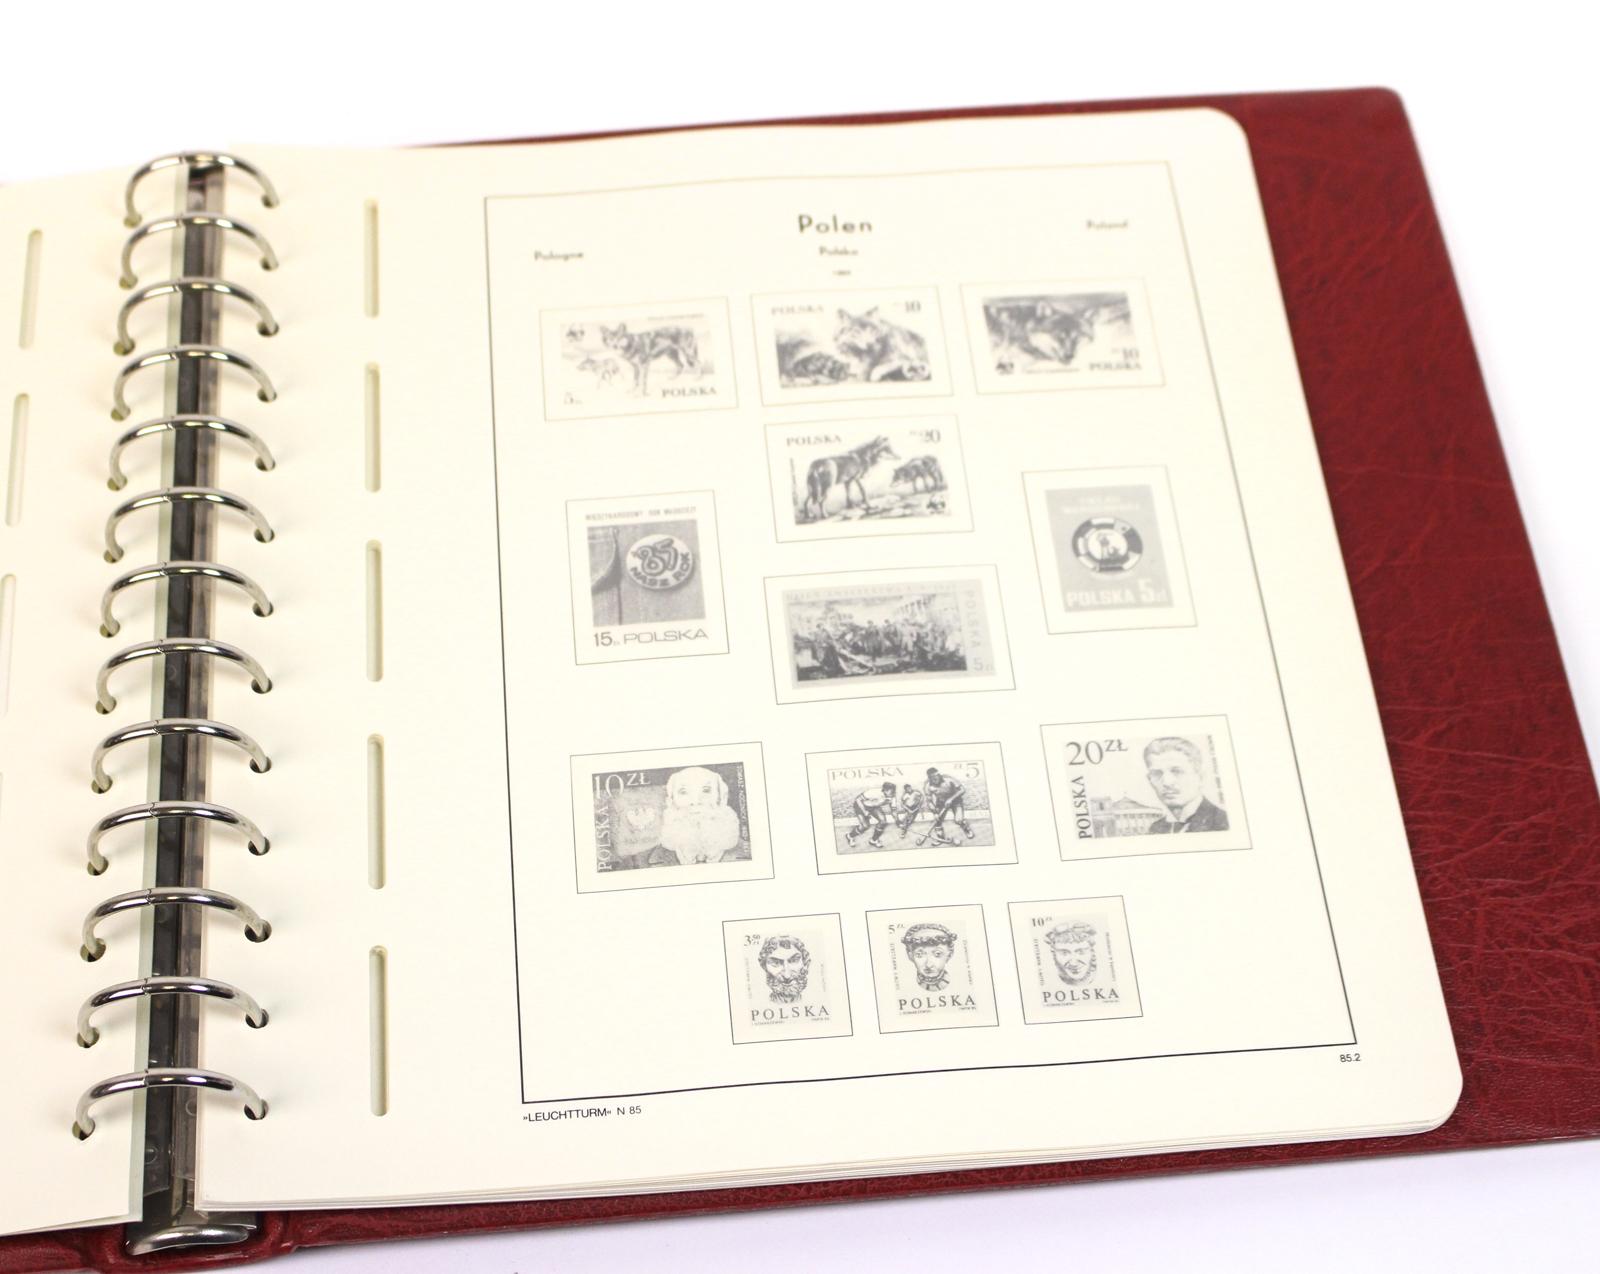 leuchtturm excellent de briefmarken vordruckalbum sf. Black Bedroom Furniture Sets. Home Design Ideas